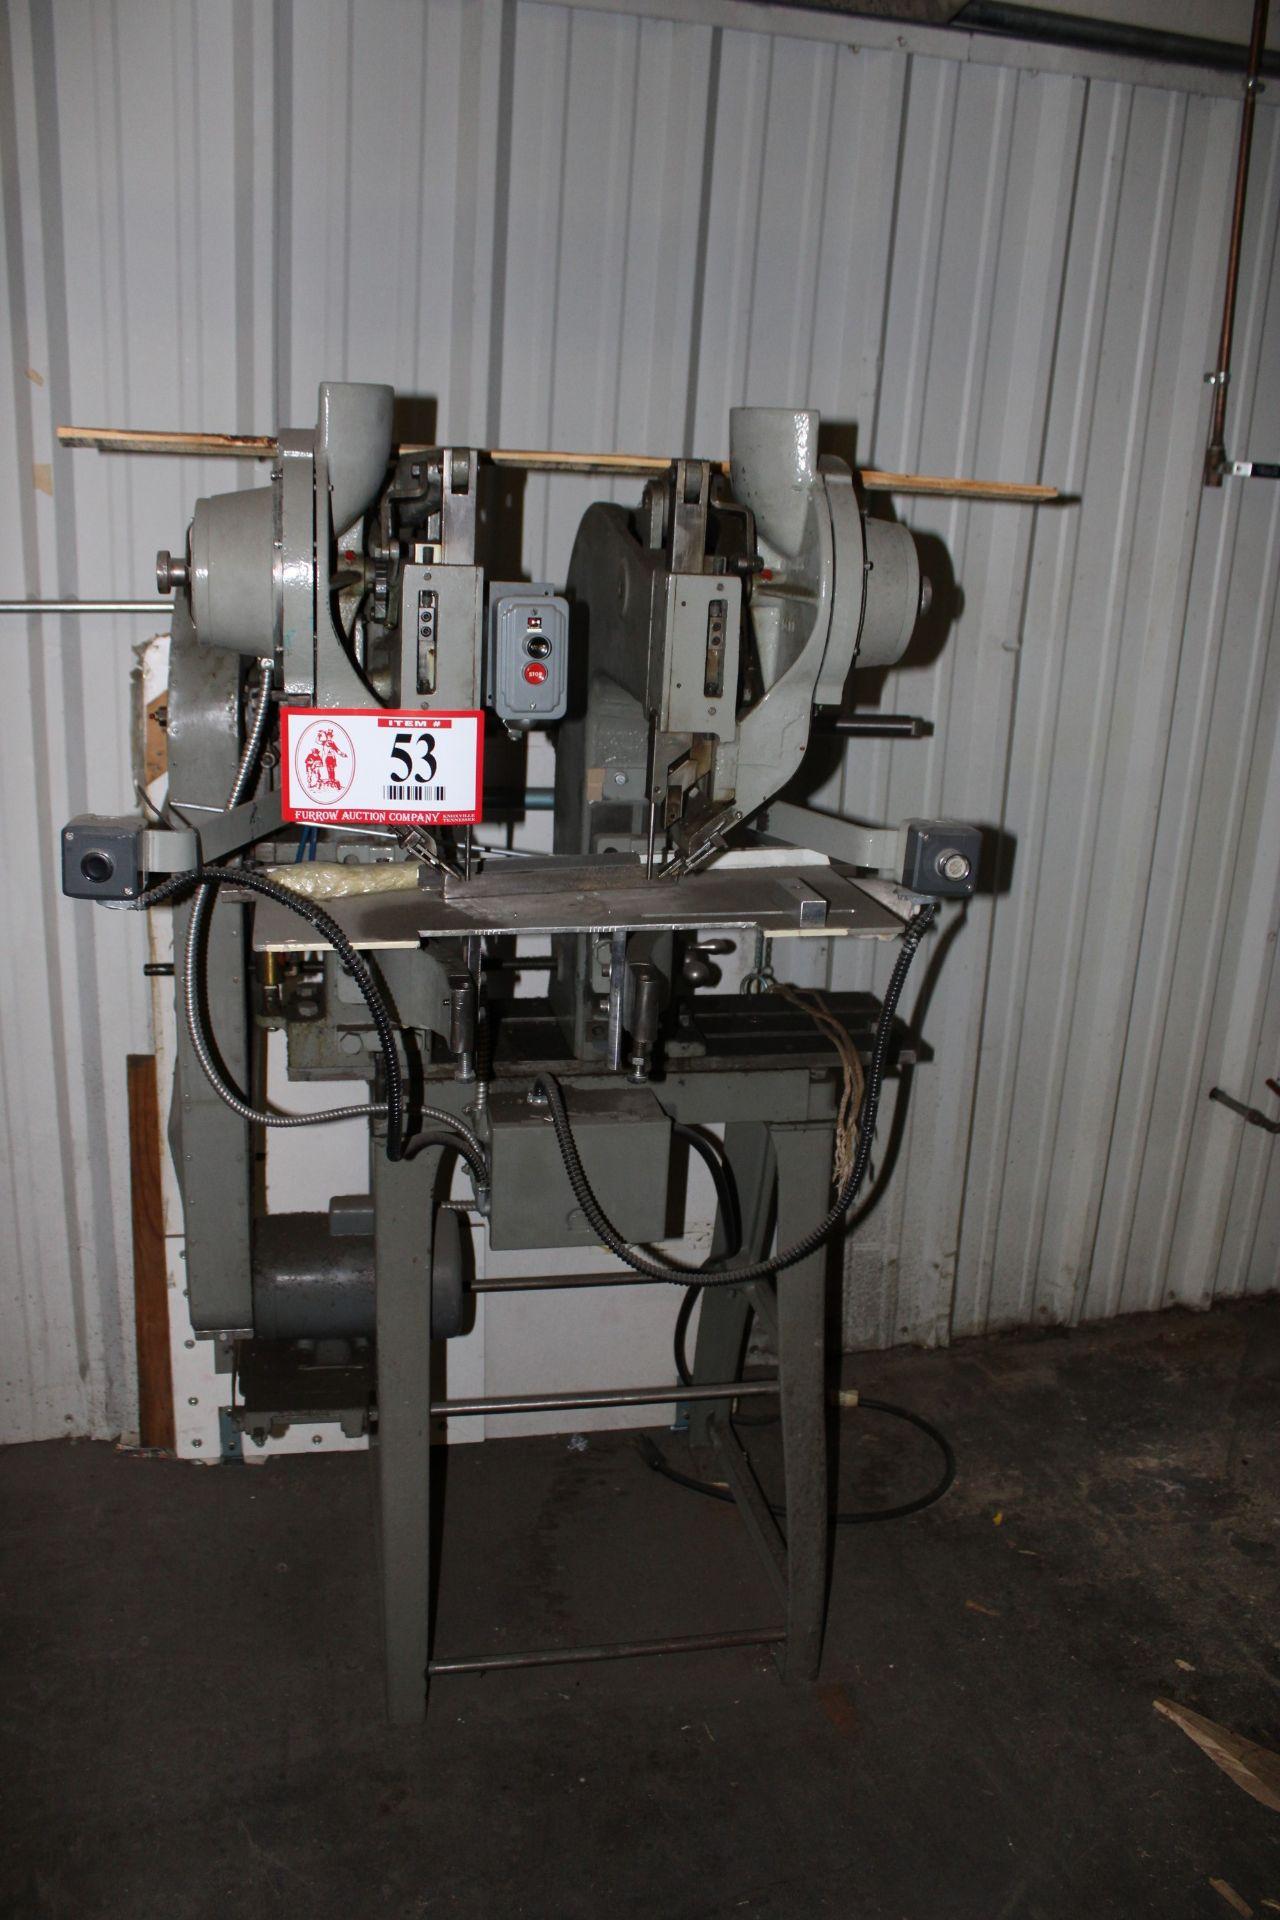 Lot 53 - CR&M ND-800 2-Head Rivet Machine